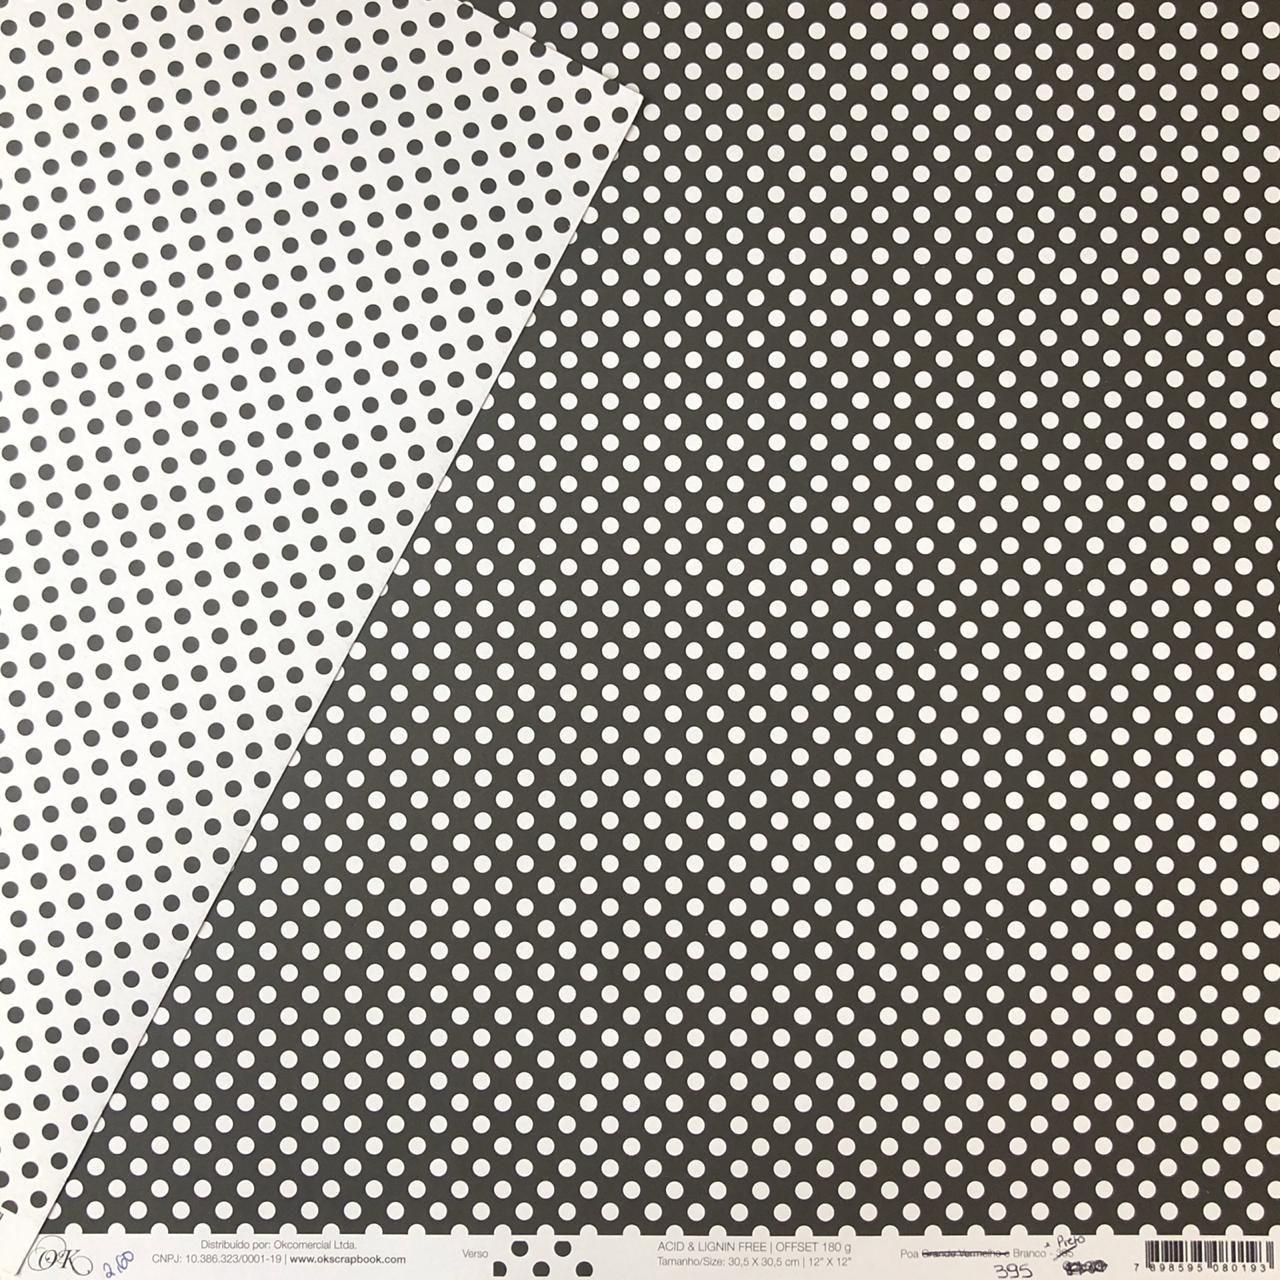 Papel Scrap - Poá Branco e Preto - Ok Scrapbook (395)